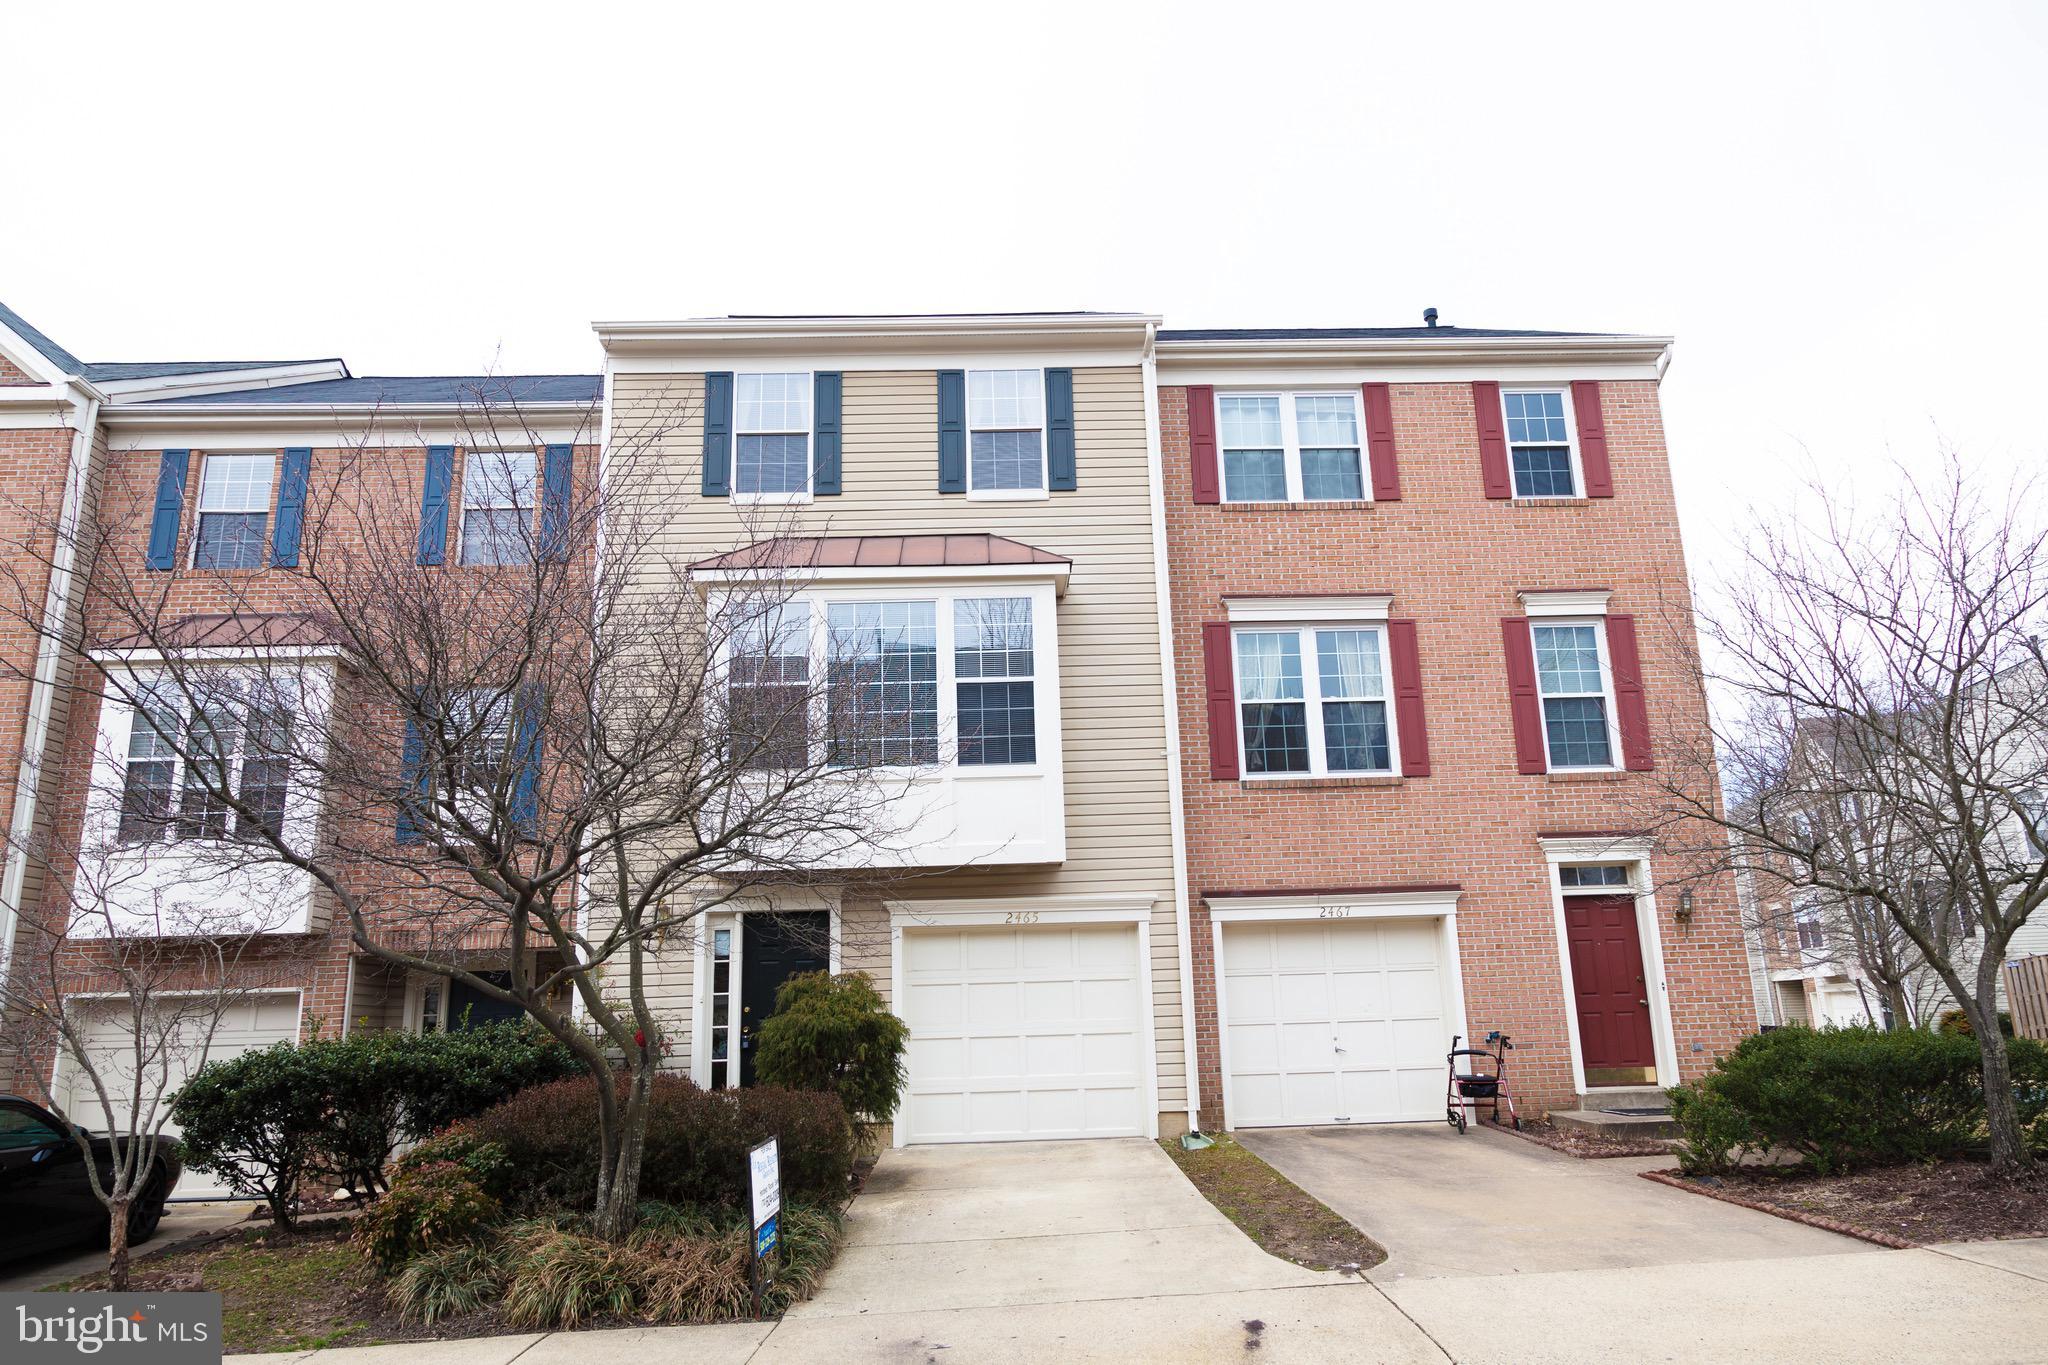 2465 CLOVER FIELD CIRCLE, Herndon, 20171 | Heather Gosman, licensed  Virginia Real Estate Agent - RE/MAX Gateway Ashburn